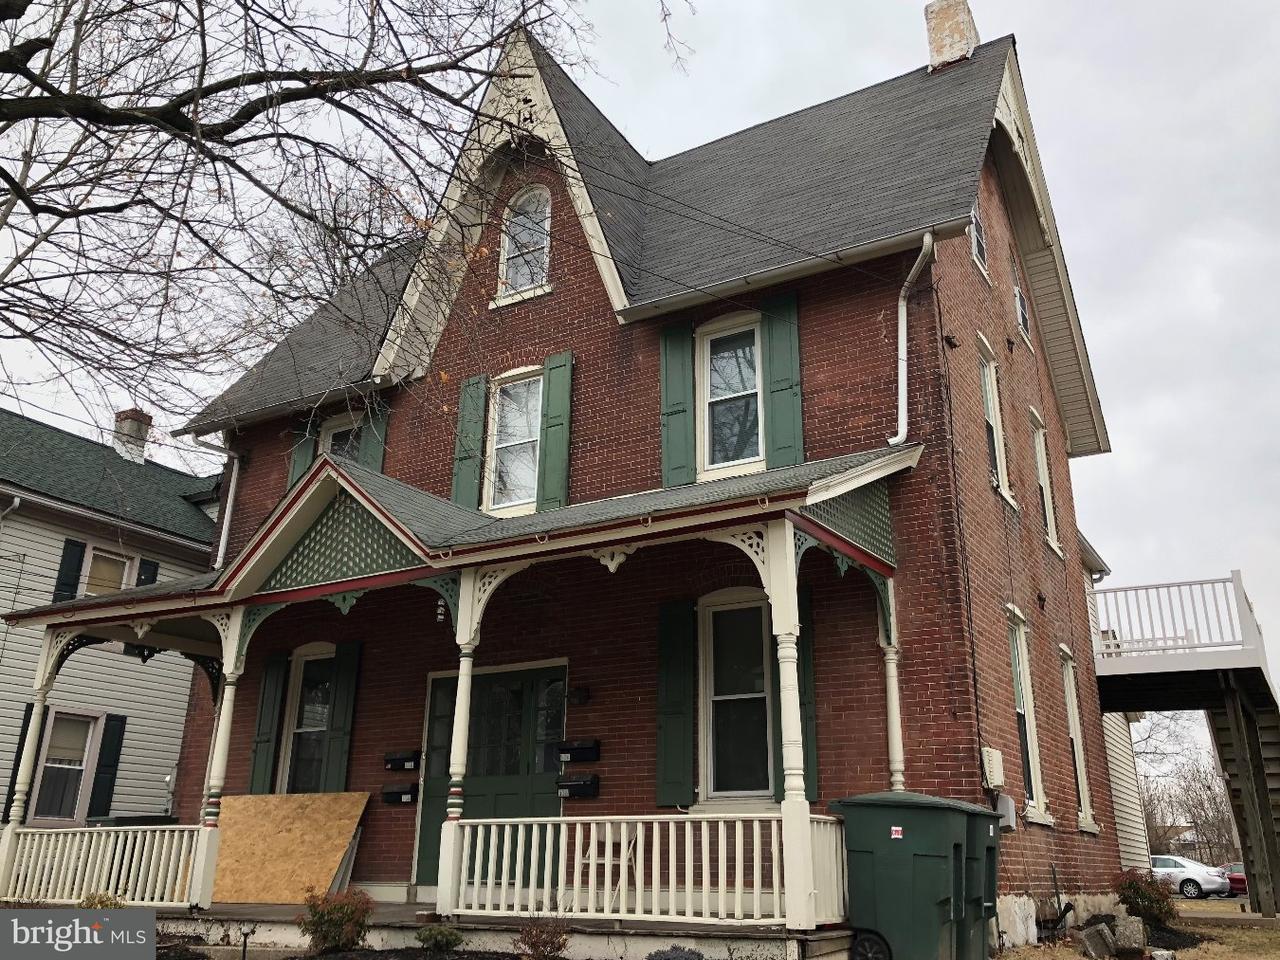 Quadraplex 为 出租 在 55 N MAIN ST #2ND FL Chalfont, 宾夕法尼亚州 18914 美国